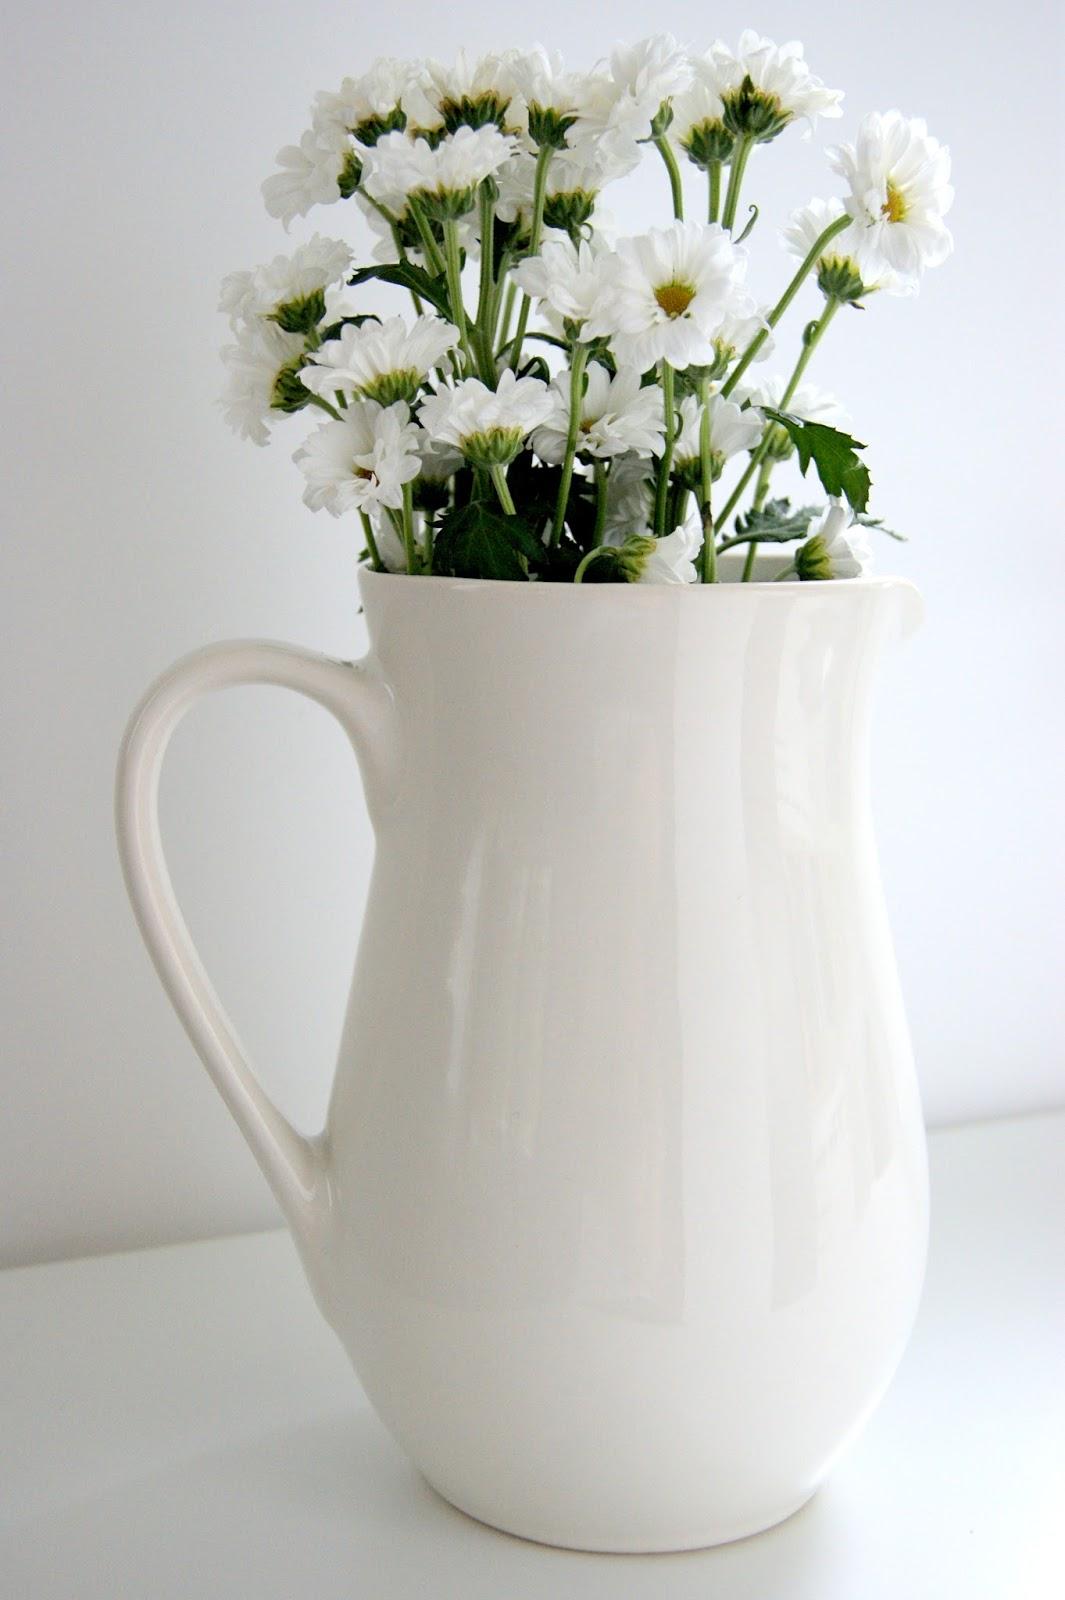 Biele džbány - Obrázok č. 1